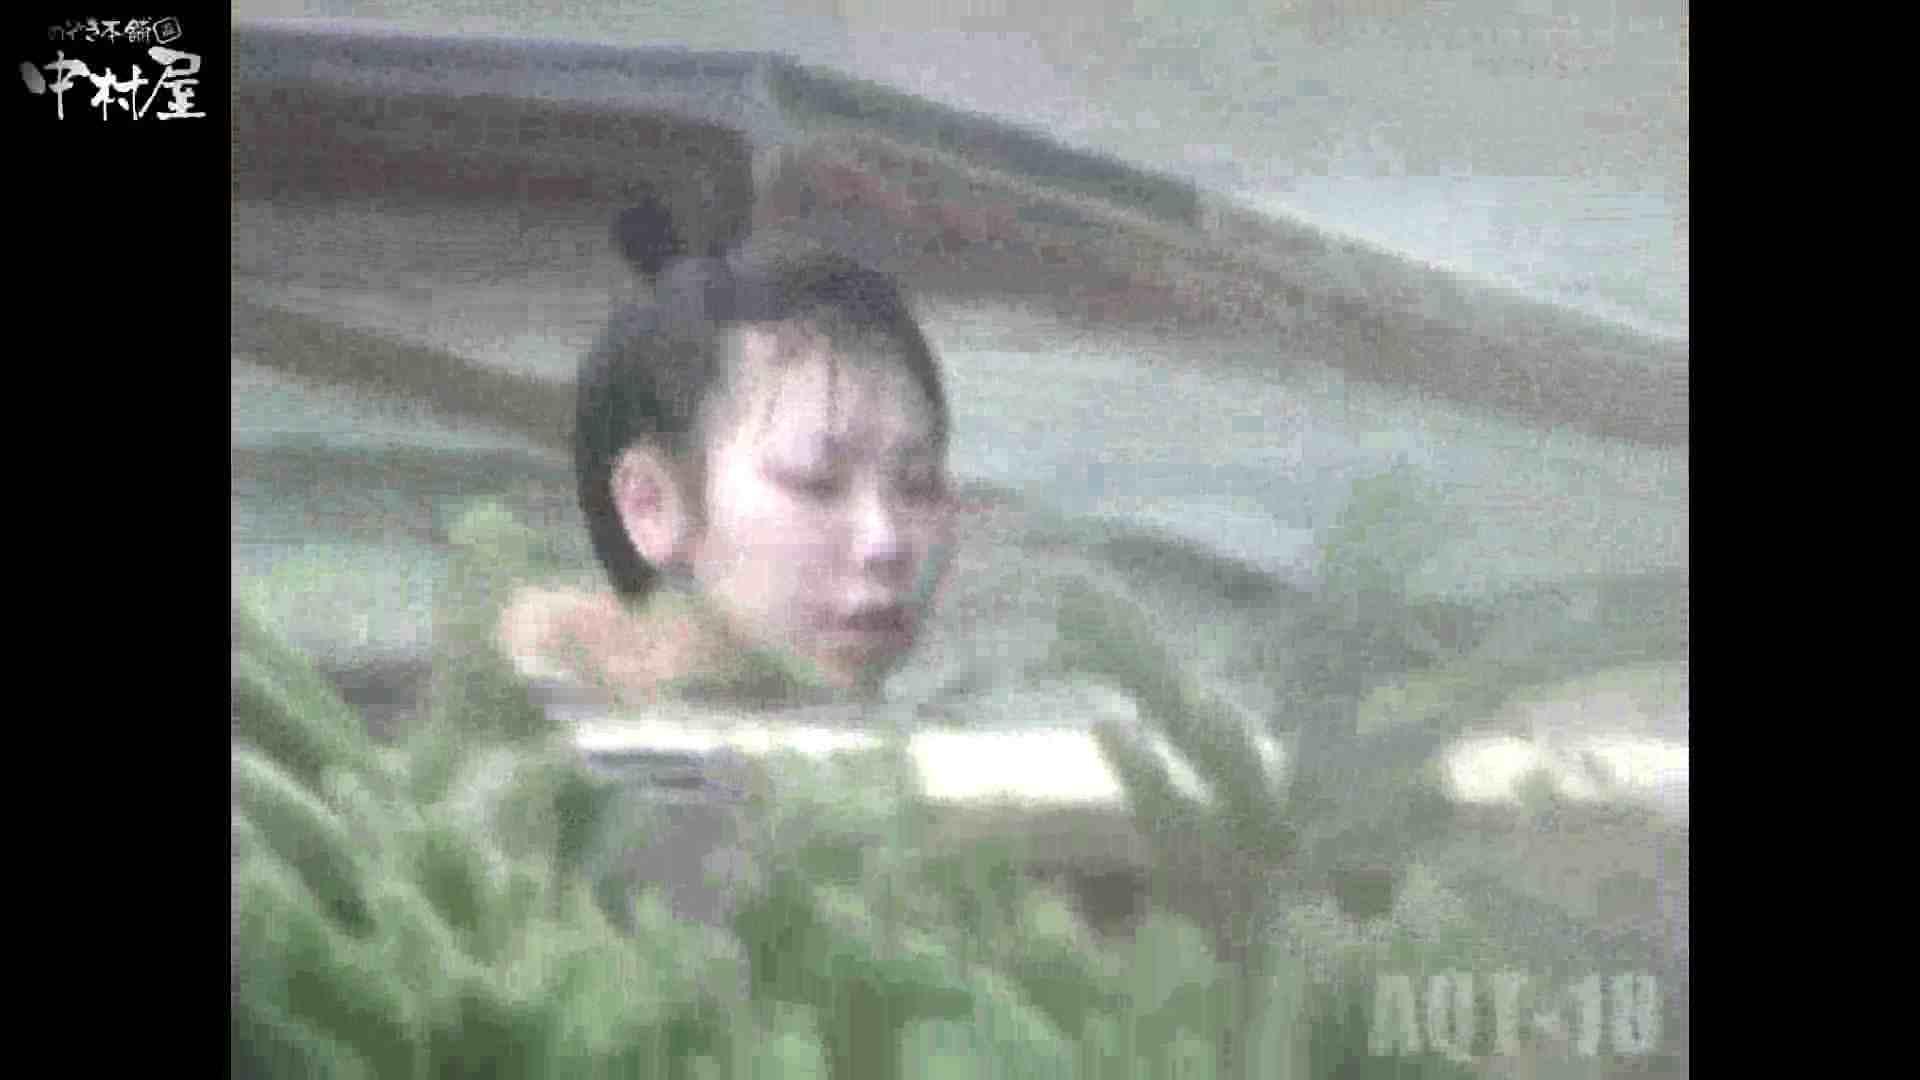 Aquaな露天風呂Vol.882潜入盗撮露天風呂十八判湯 其の二 HなOL | 盗撮  77pic 49